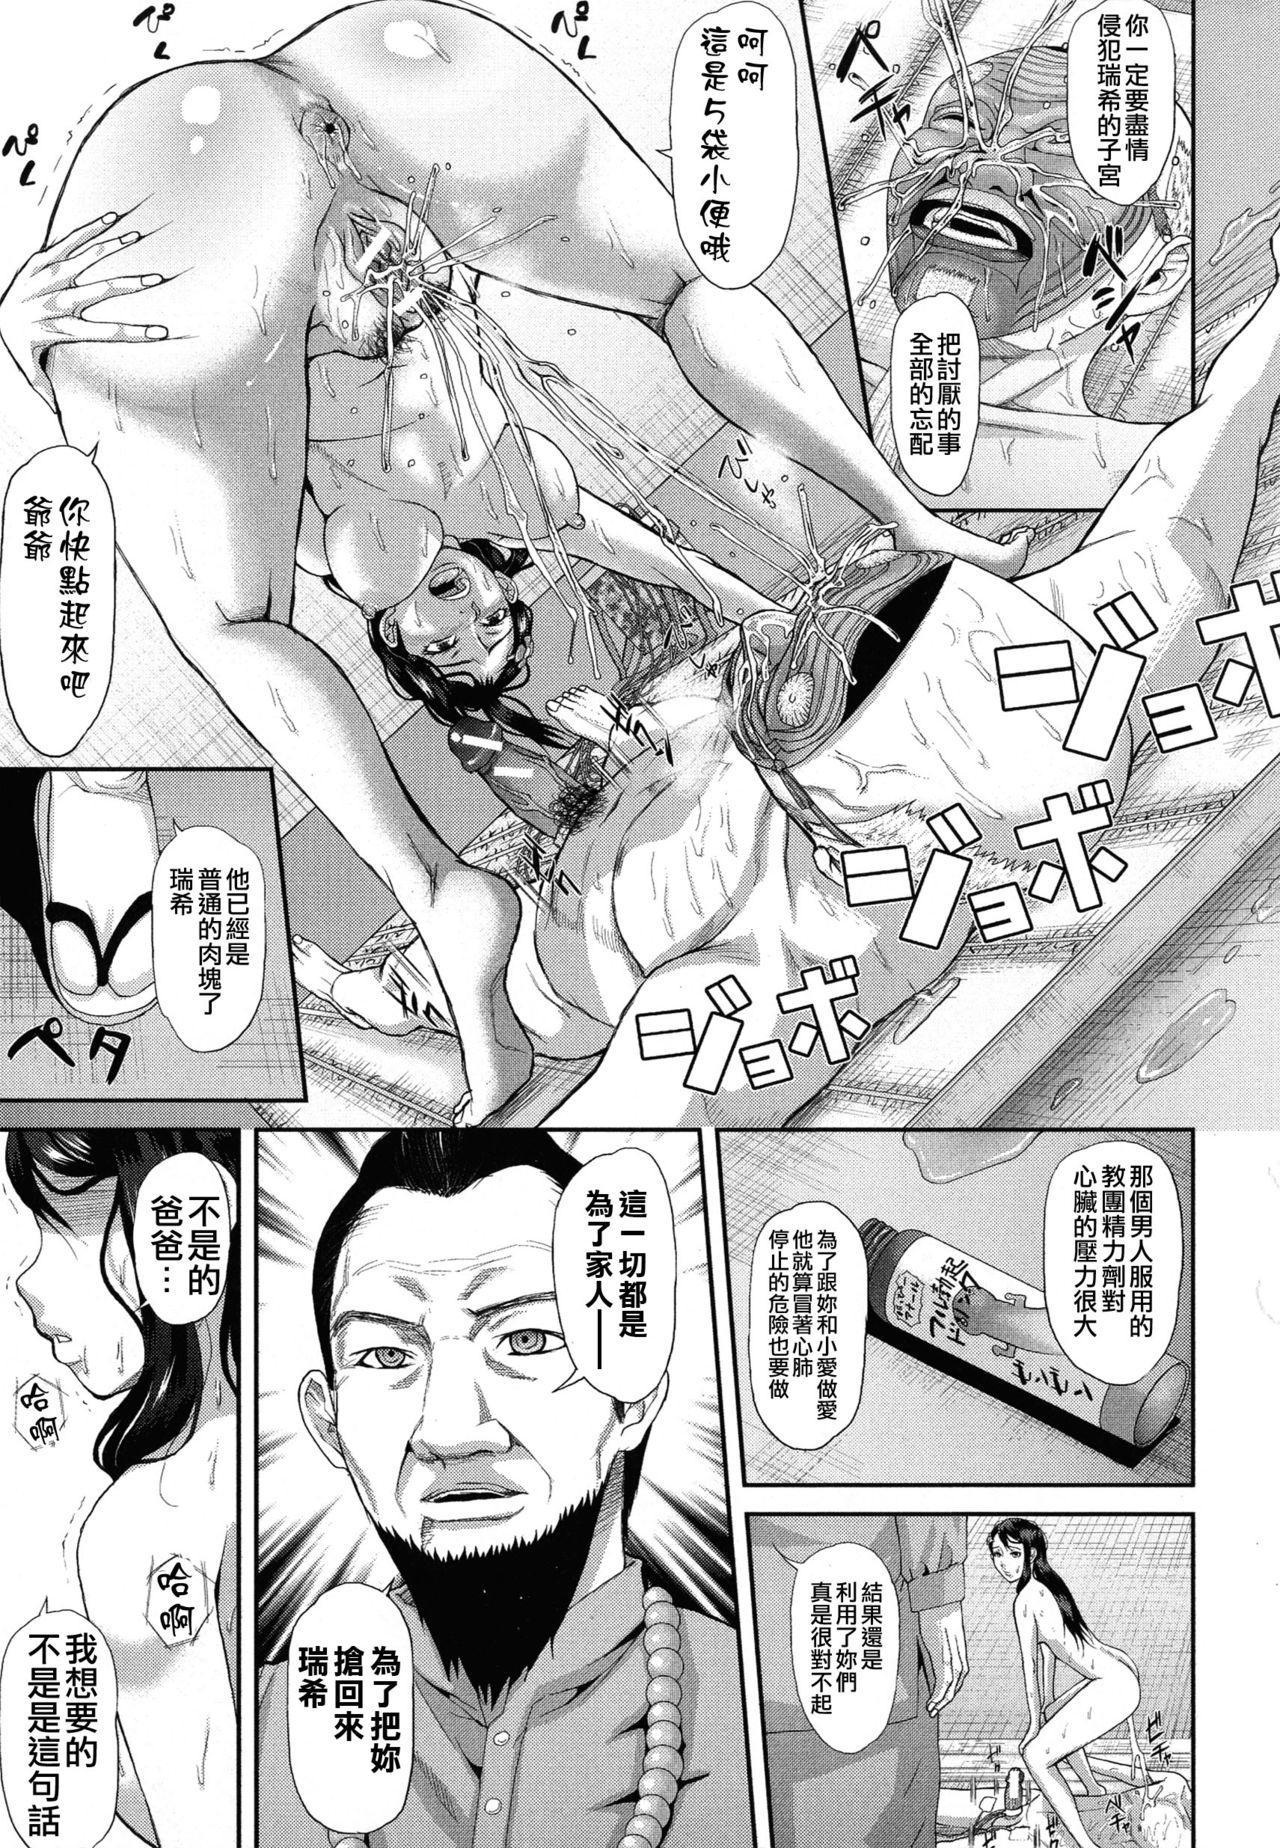 [Honebuto Danshaku] Innou Kaizou Program ~Oyako Zecchou Cult Ochi~ [Chinese]【不想记名重嵌--高质量图源】 214